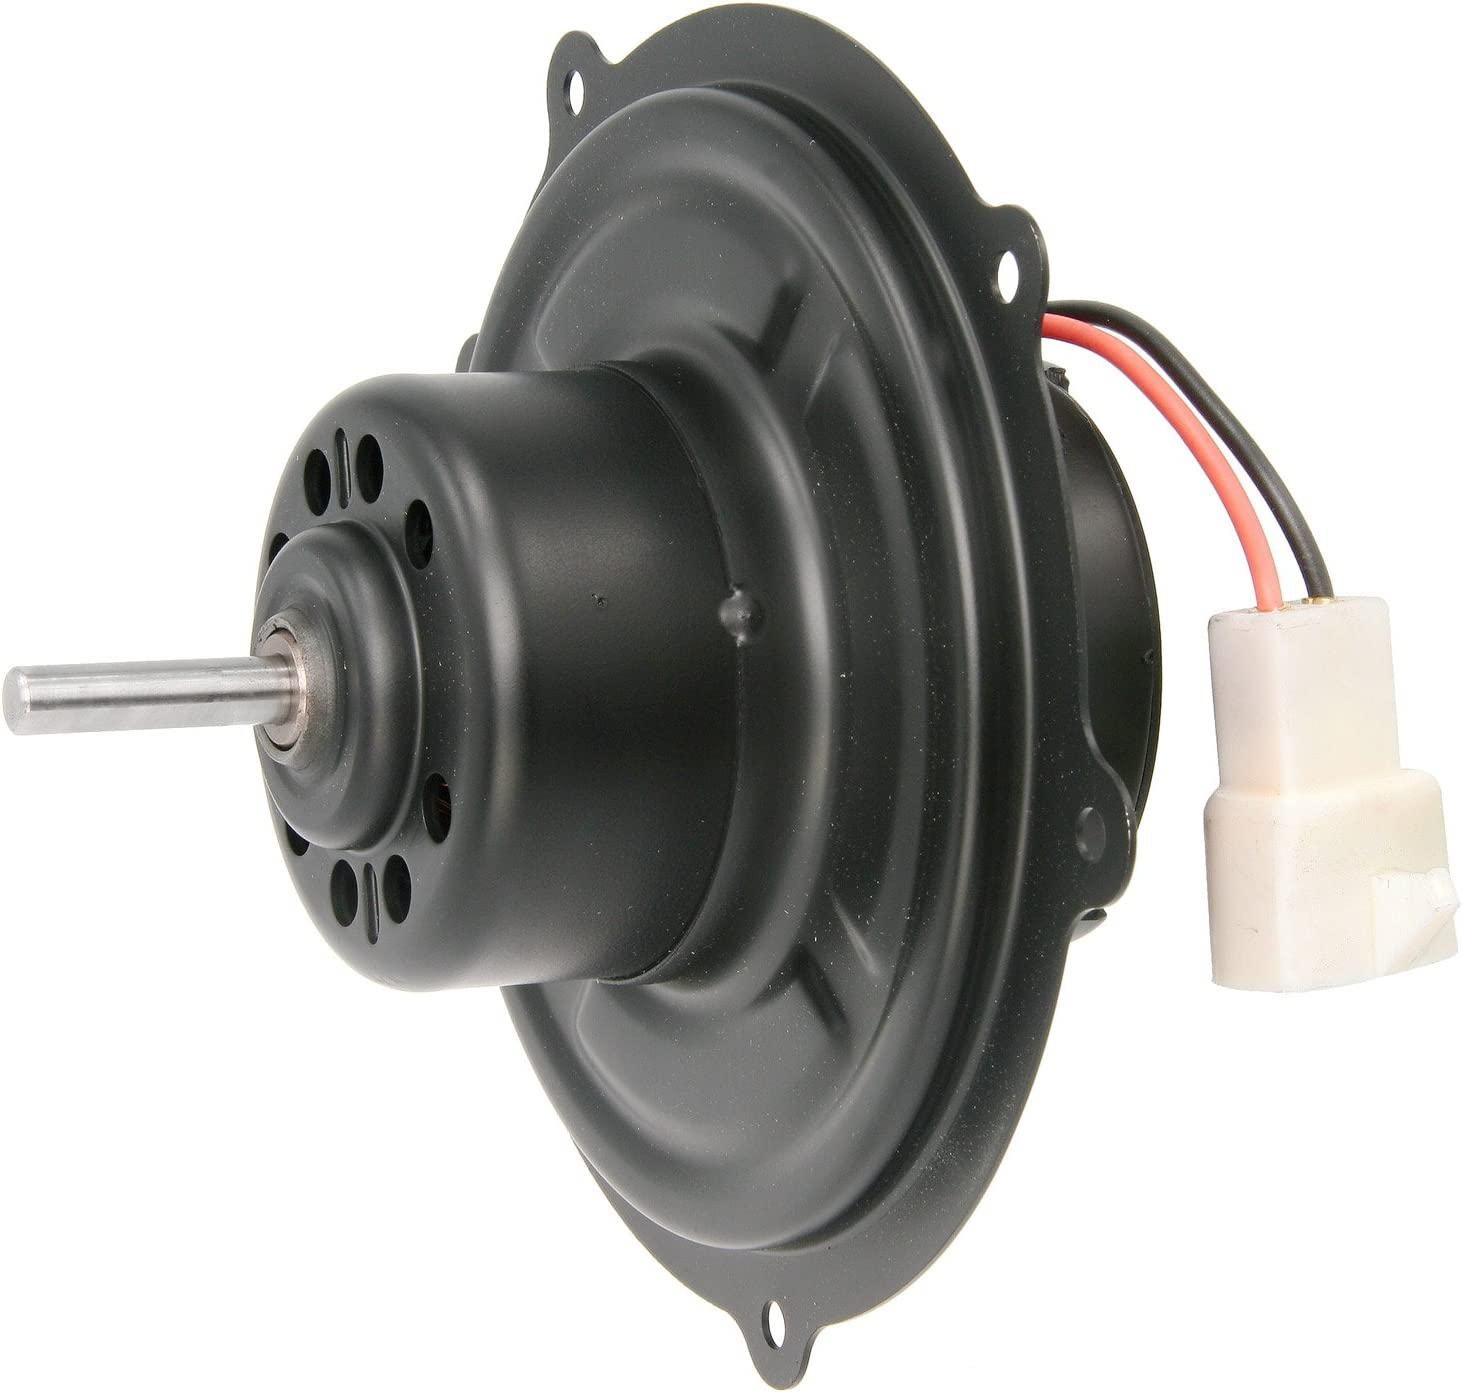 Four Seasons//Trumark 35399 Blower Motor without Wheel